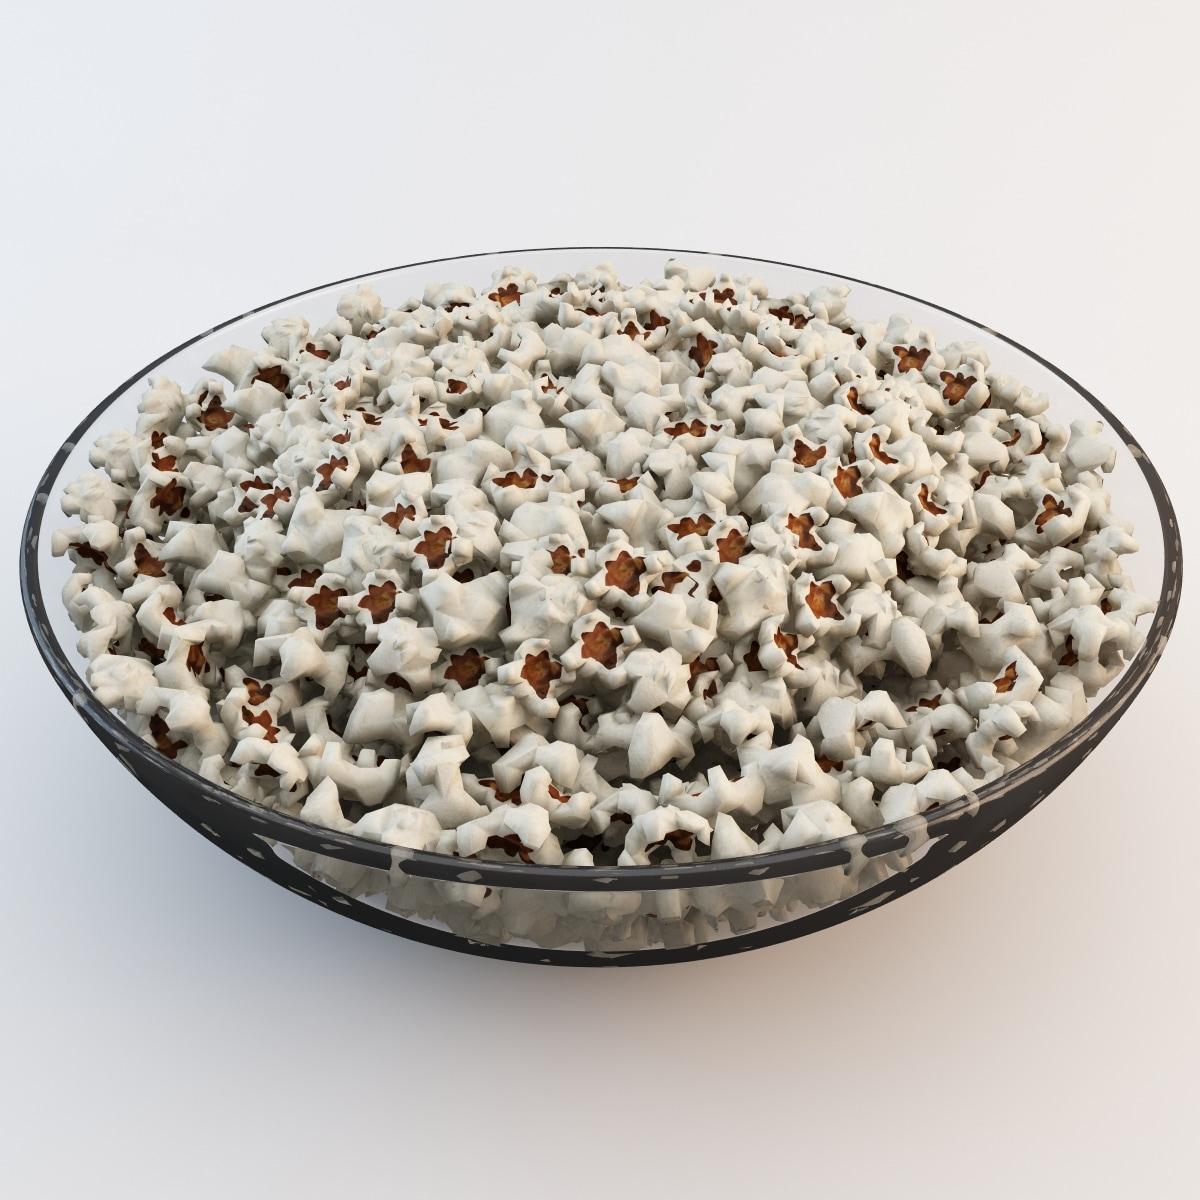 Bowl_of_Popcorn_005.jpg